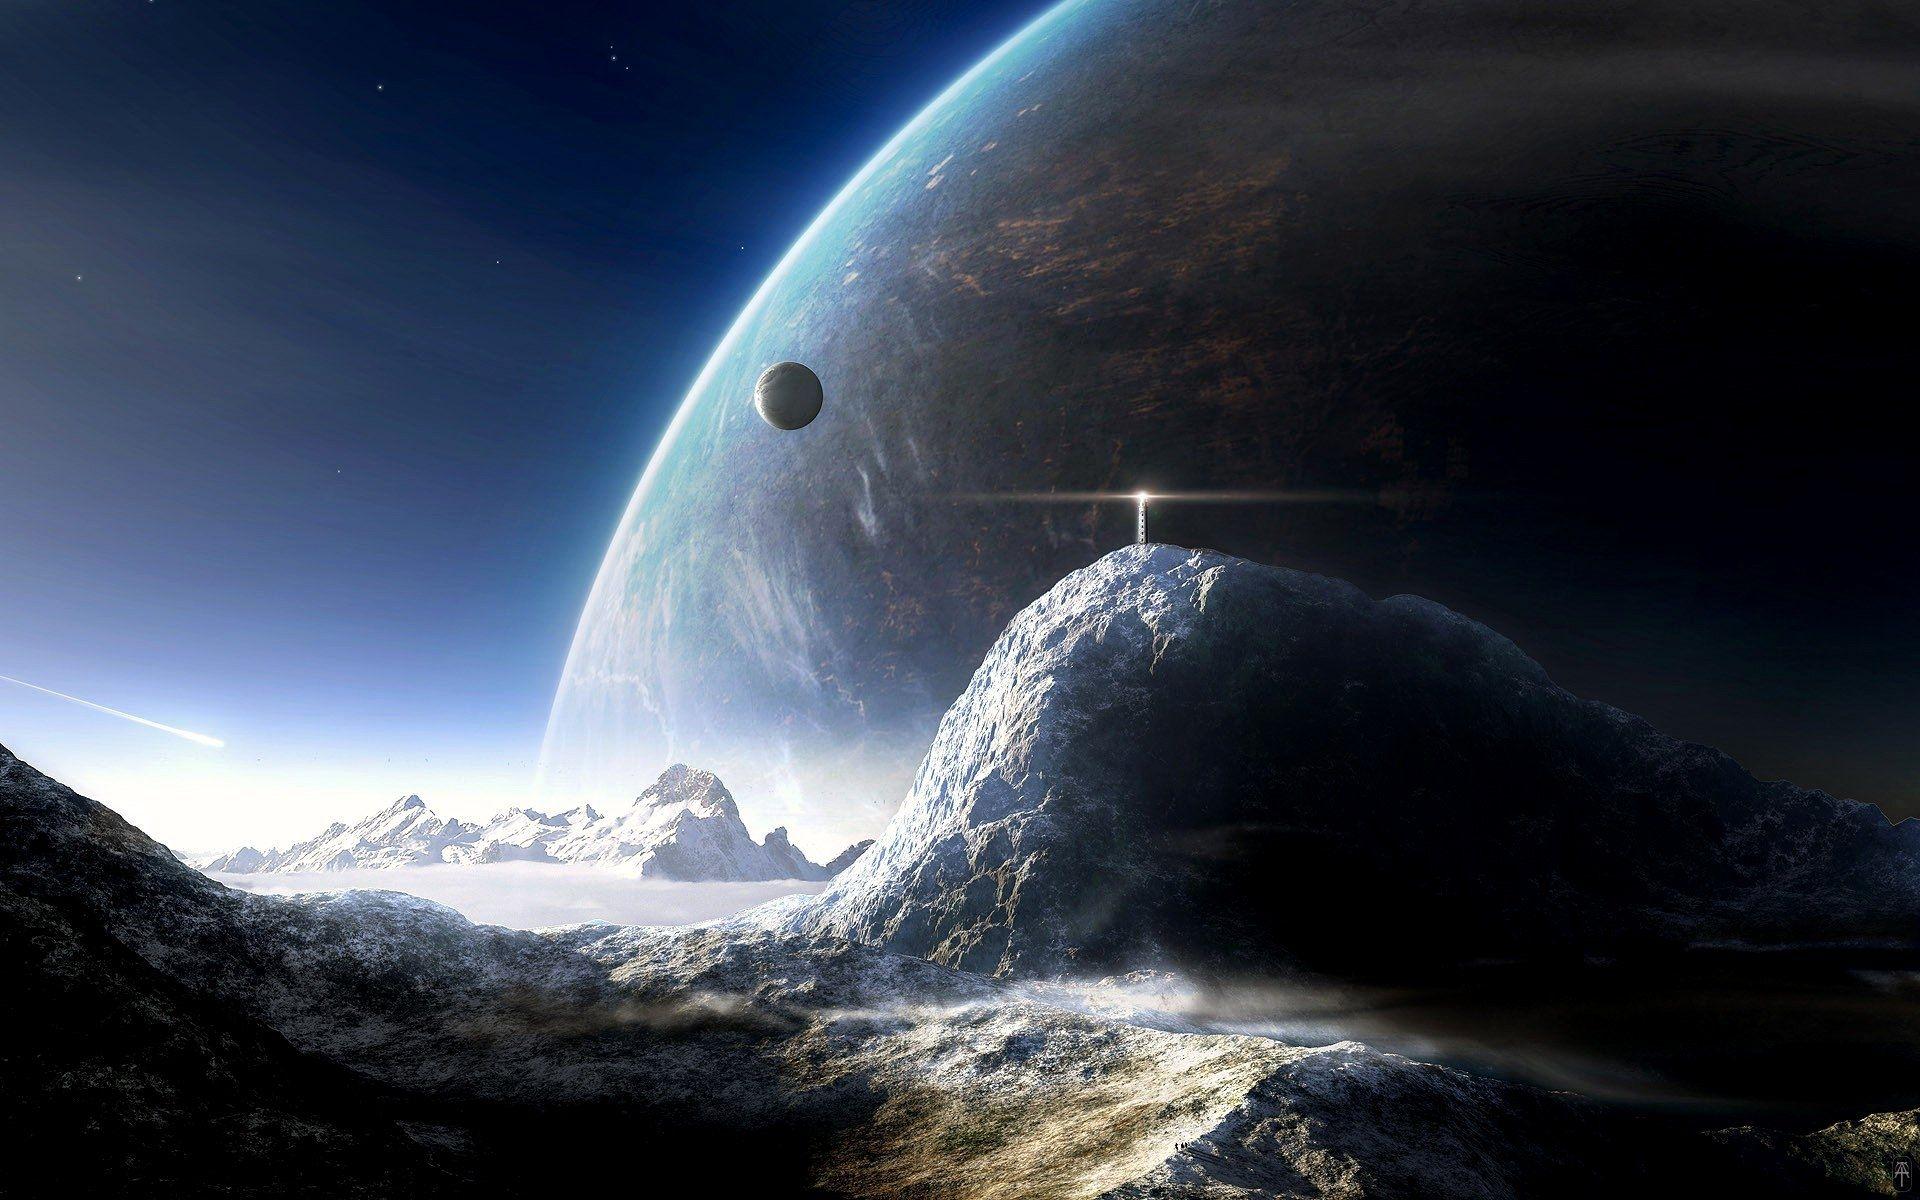 10 Top Sci Fi Space Wallpaper Full Hd 1080p For Pc Background Planets Wallpaper Sci Fi Wallpaper Space Art